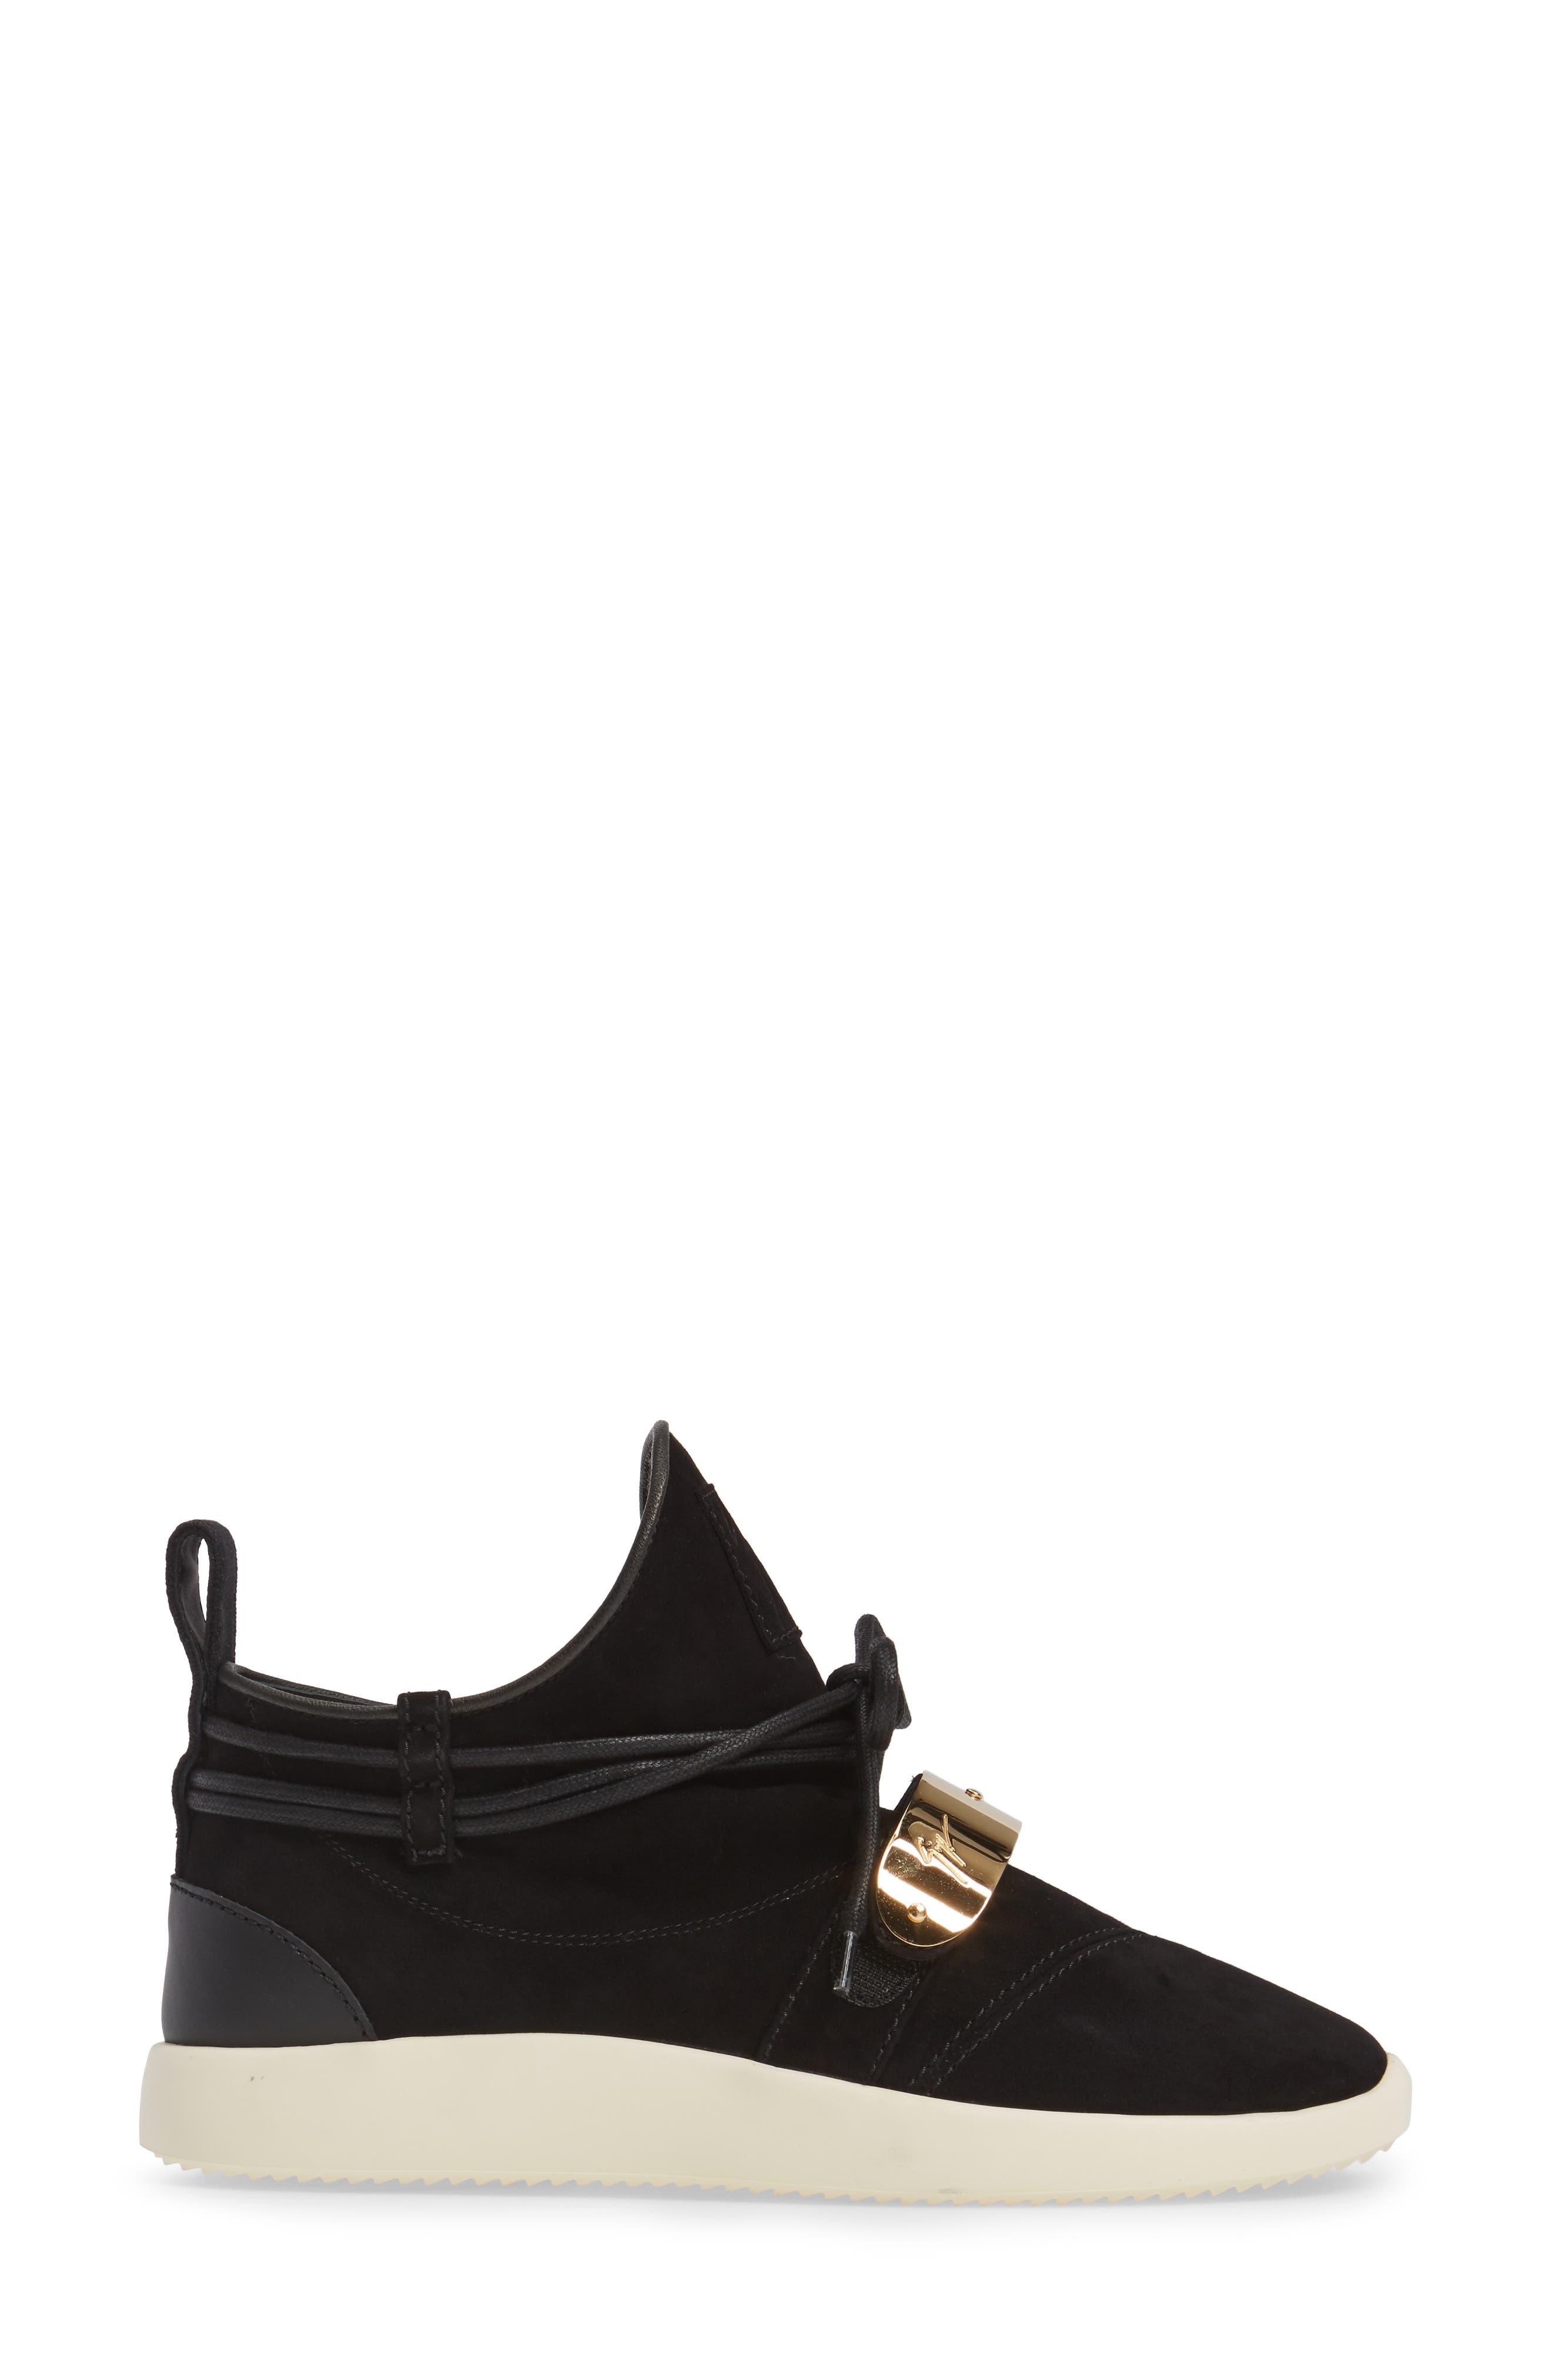 Gold Band Sneaker,                             Alternate thumbnail 3, color,                             Black